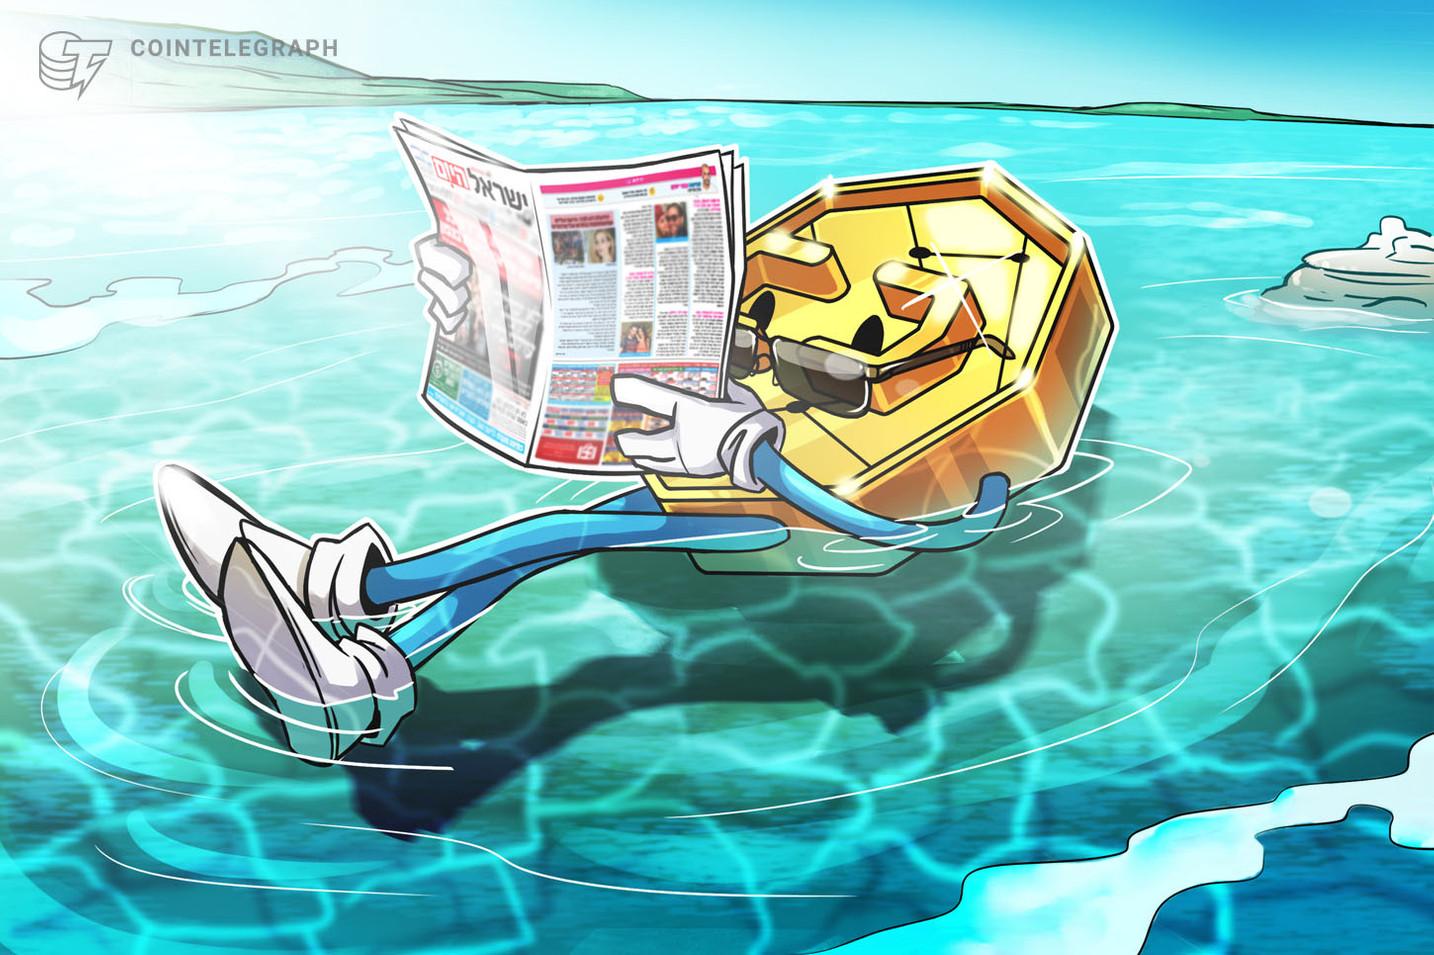 Kerajaan Israel berusaha untuk mengesan pegangan crypto di atas $ 61K